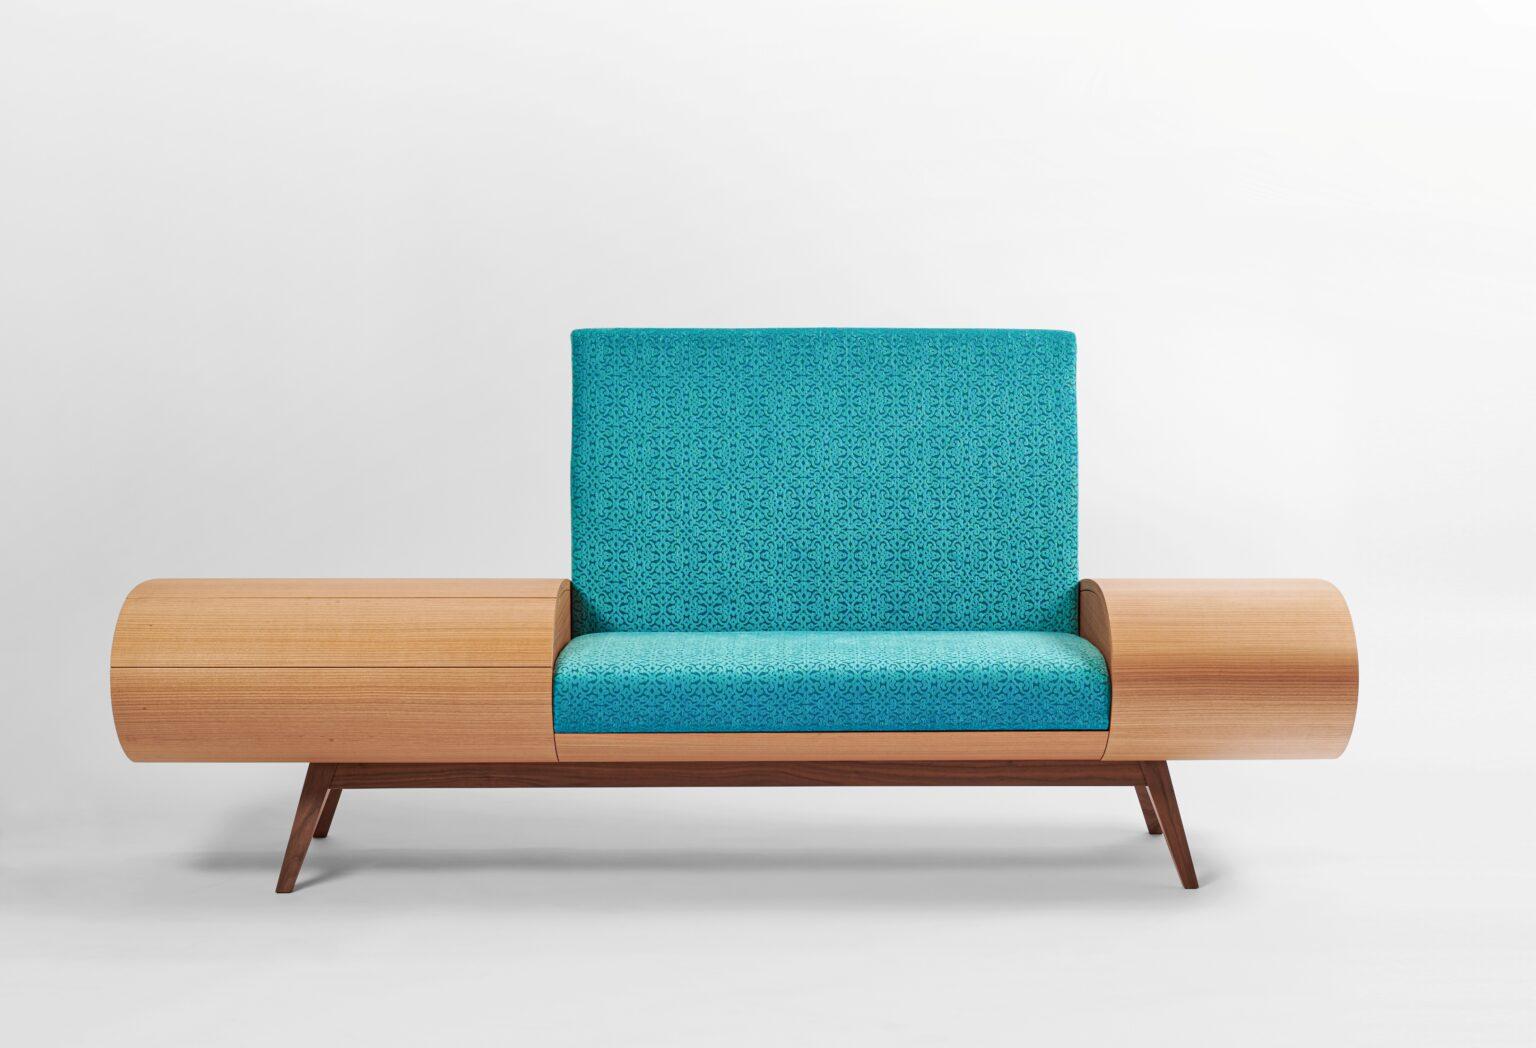 Sitzmöbel von Thomas Reisinger. Foto: EOS